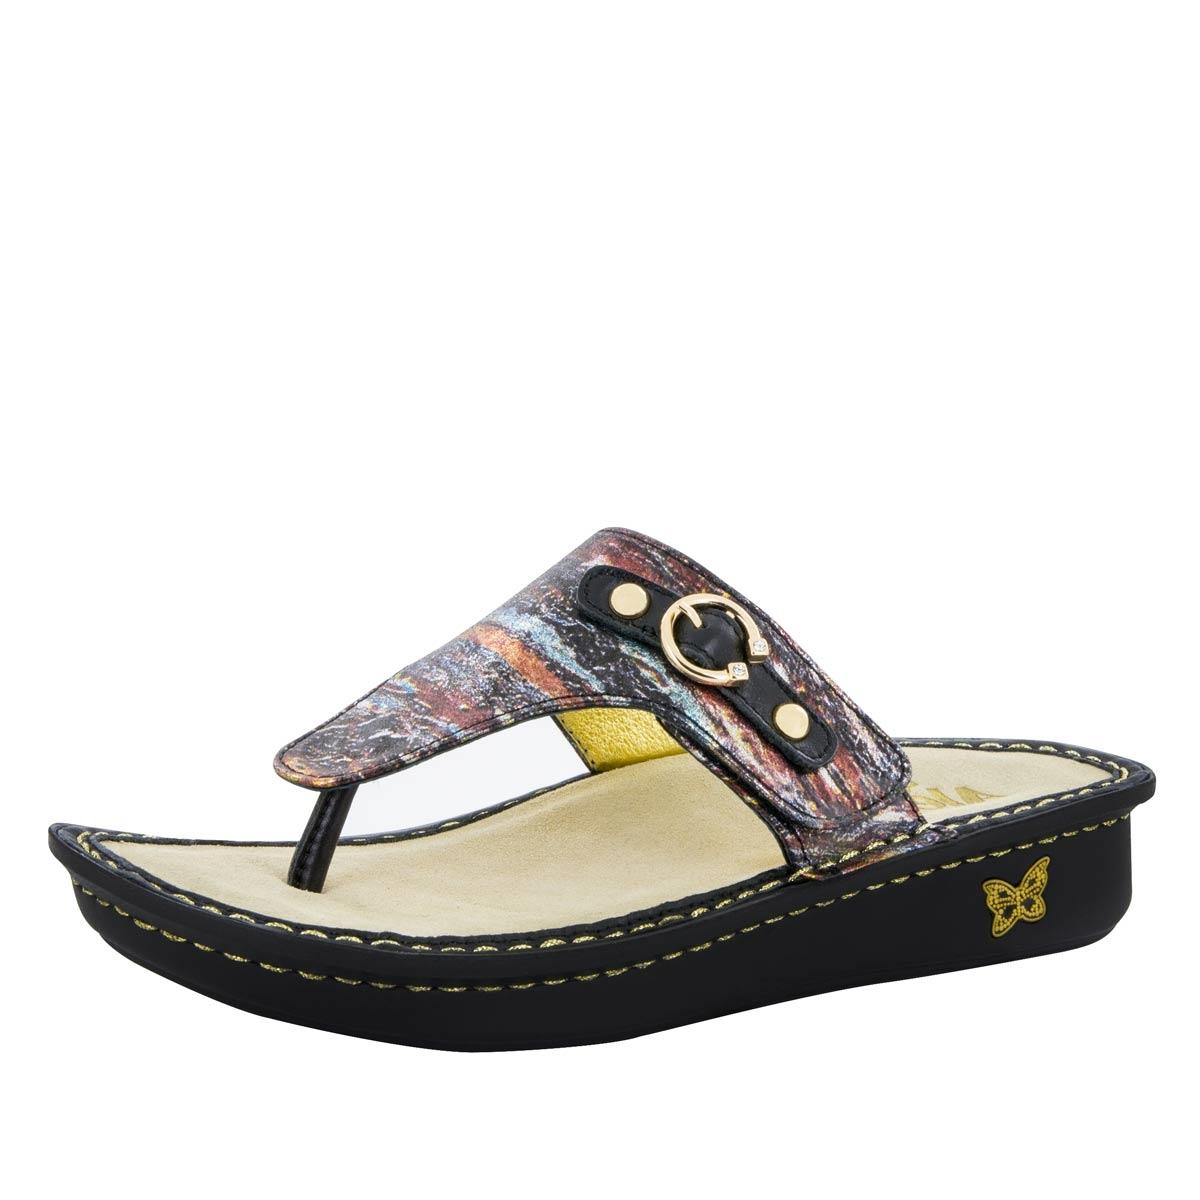 Alegria Vanessa Earthen women's comfort sandal · View Larger Photo Email ...